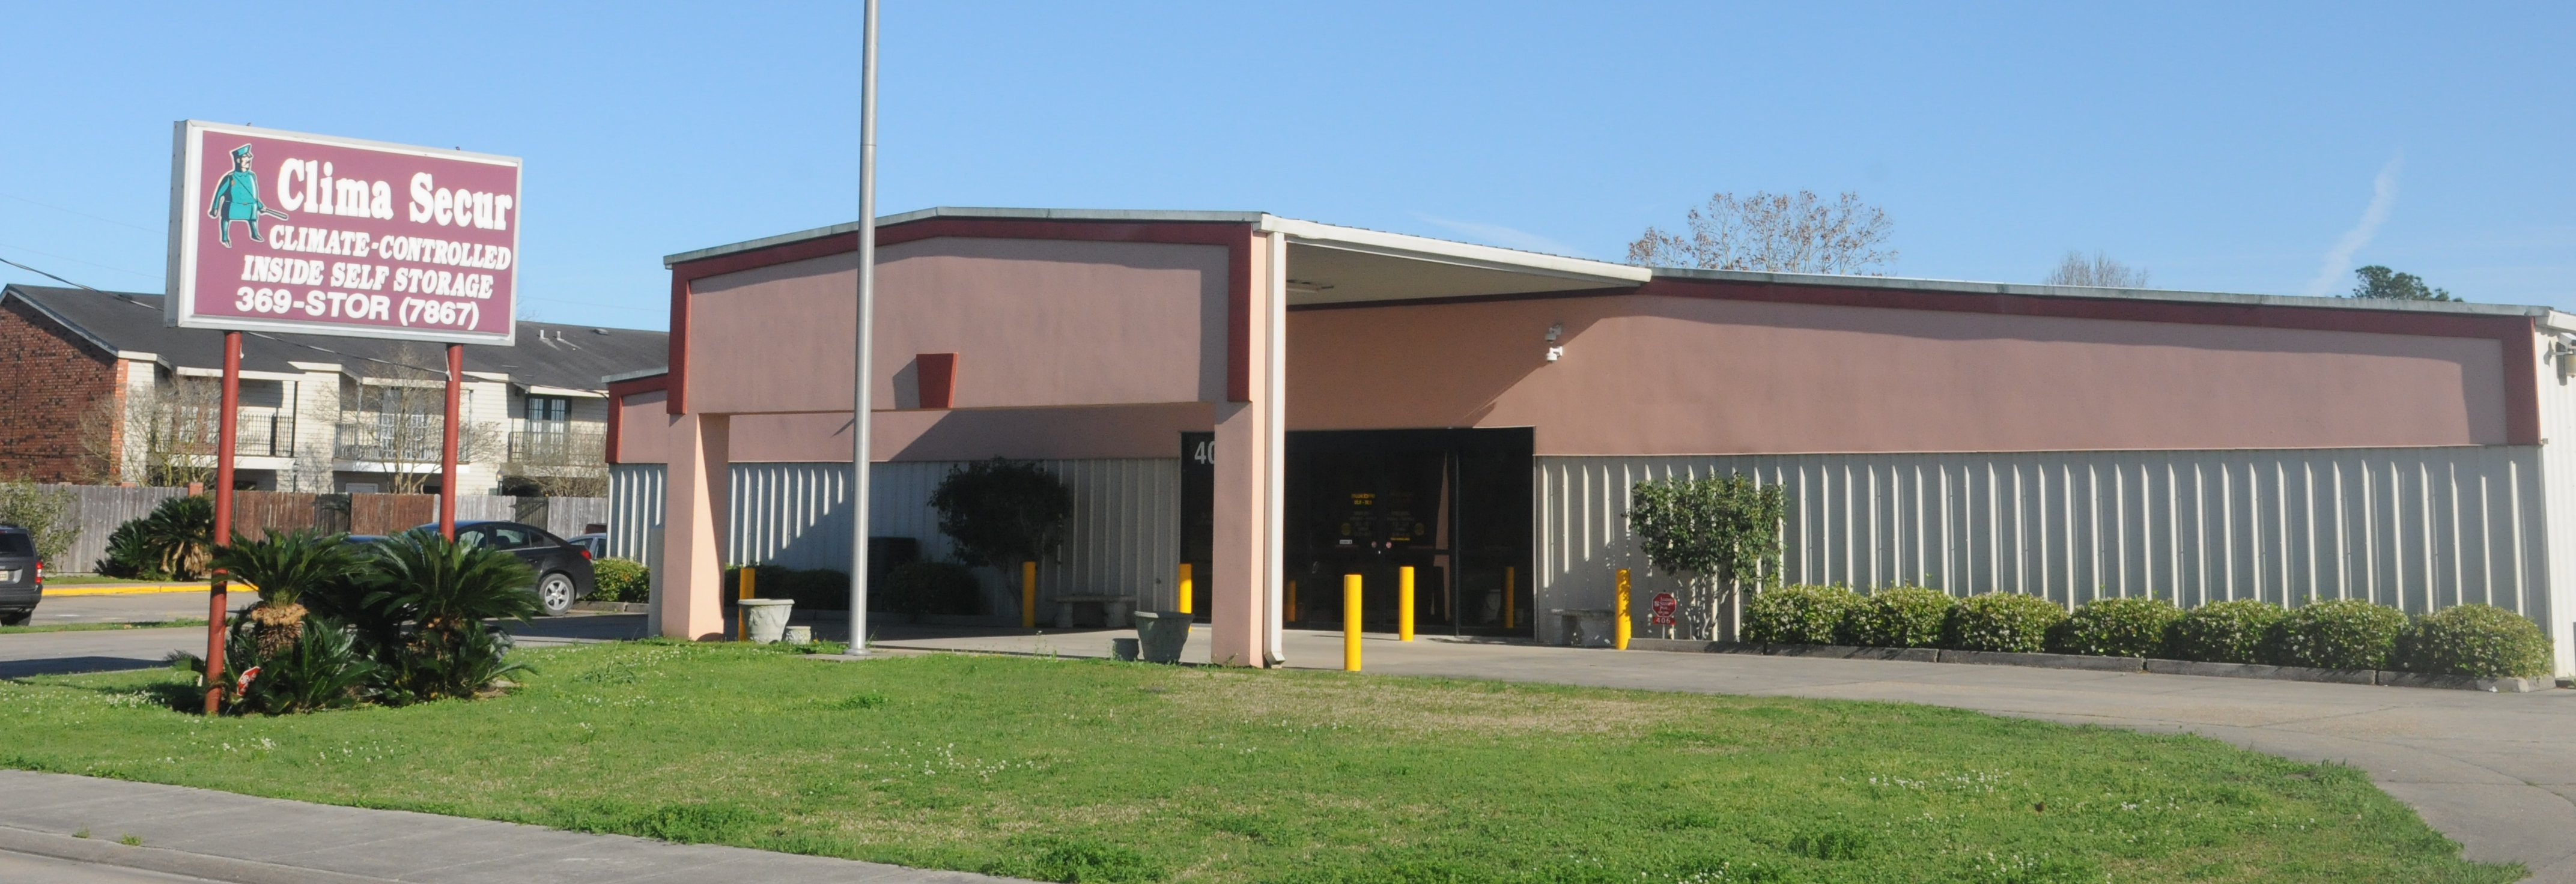 Storage units in New Iberia, Louisiana